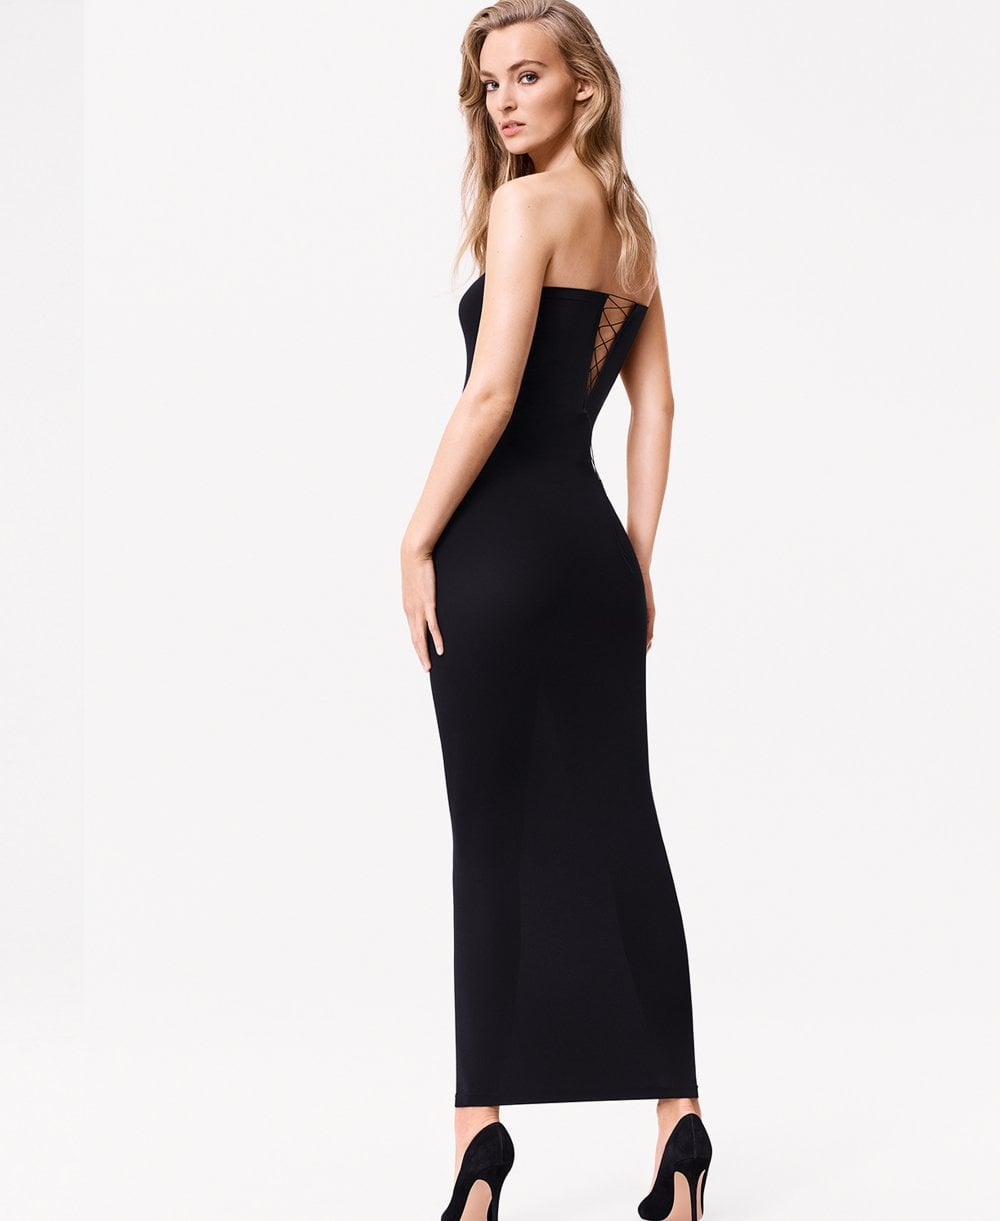 3079112e26de Wolford Grace Dress - Clothing from luxury-legs.com UK